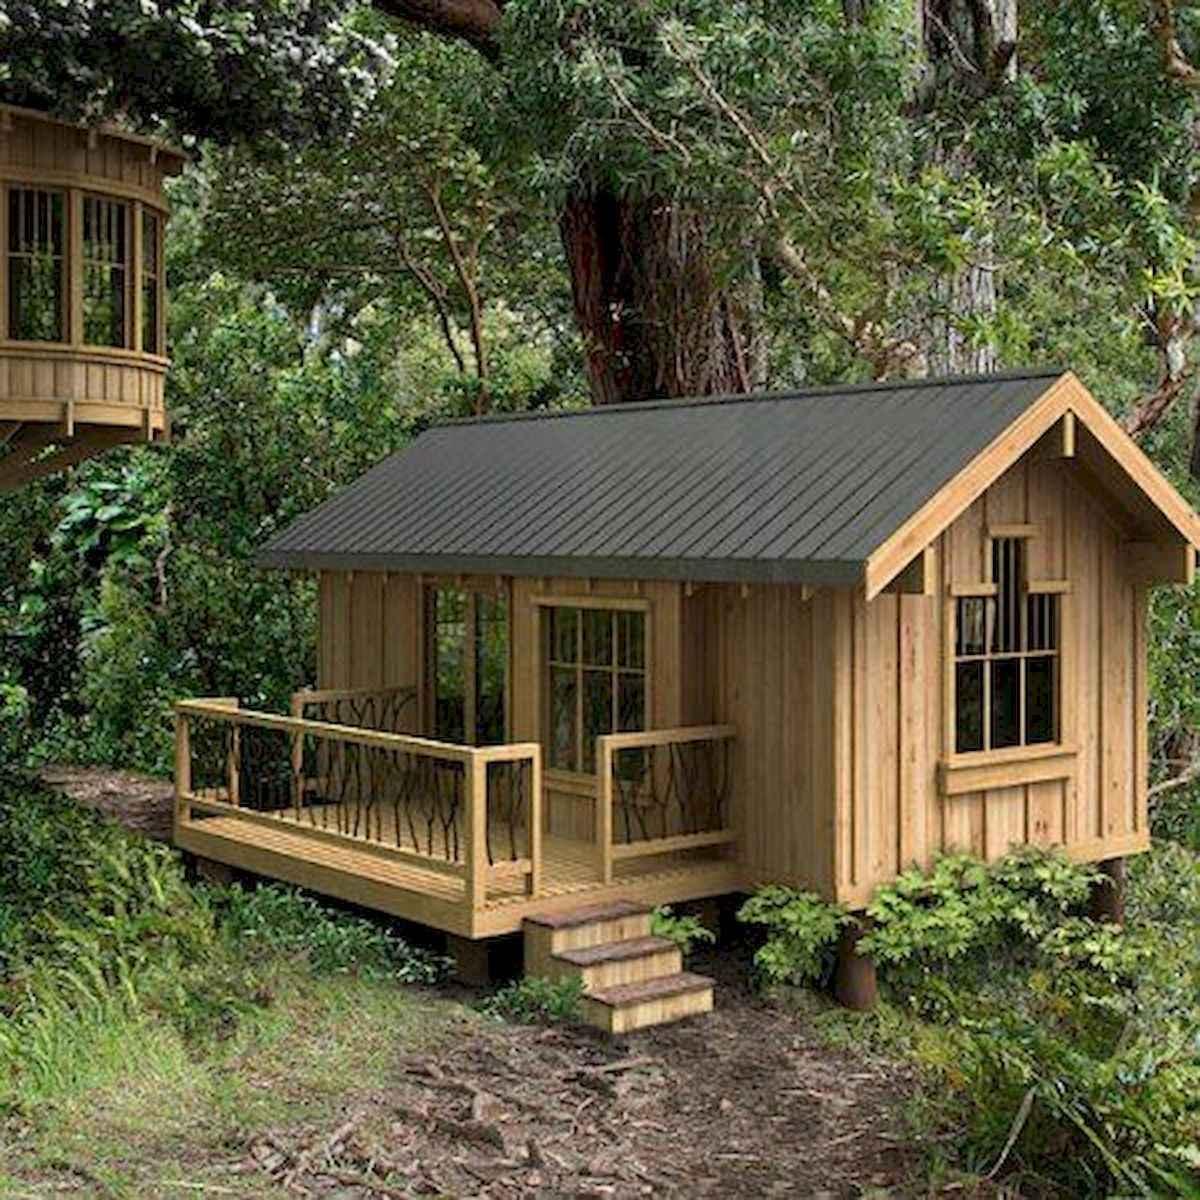 40 Best Log Cabin Homes Plans One Story Design Ideas (15)